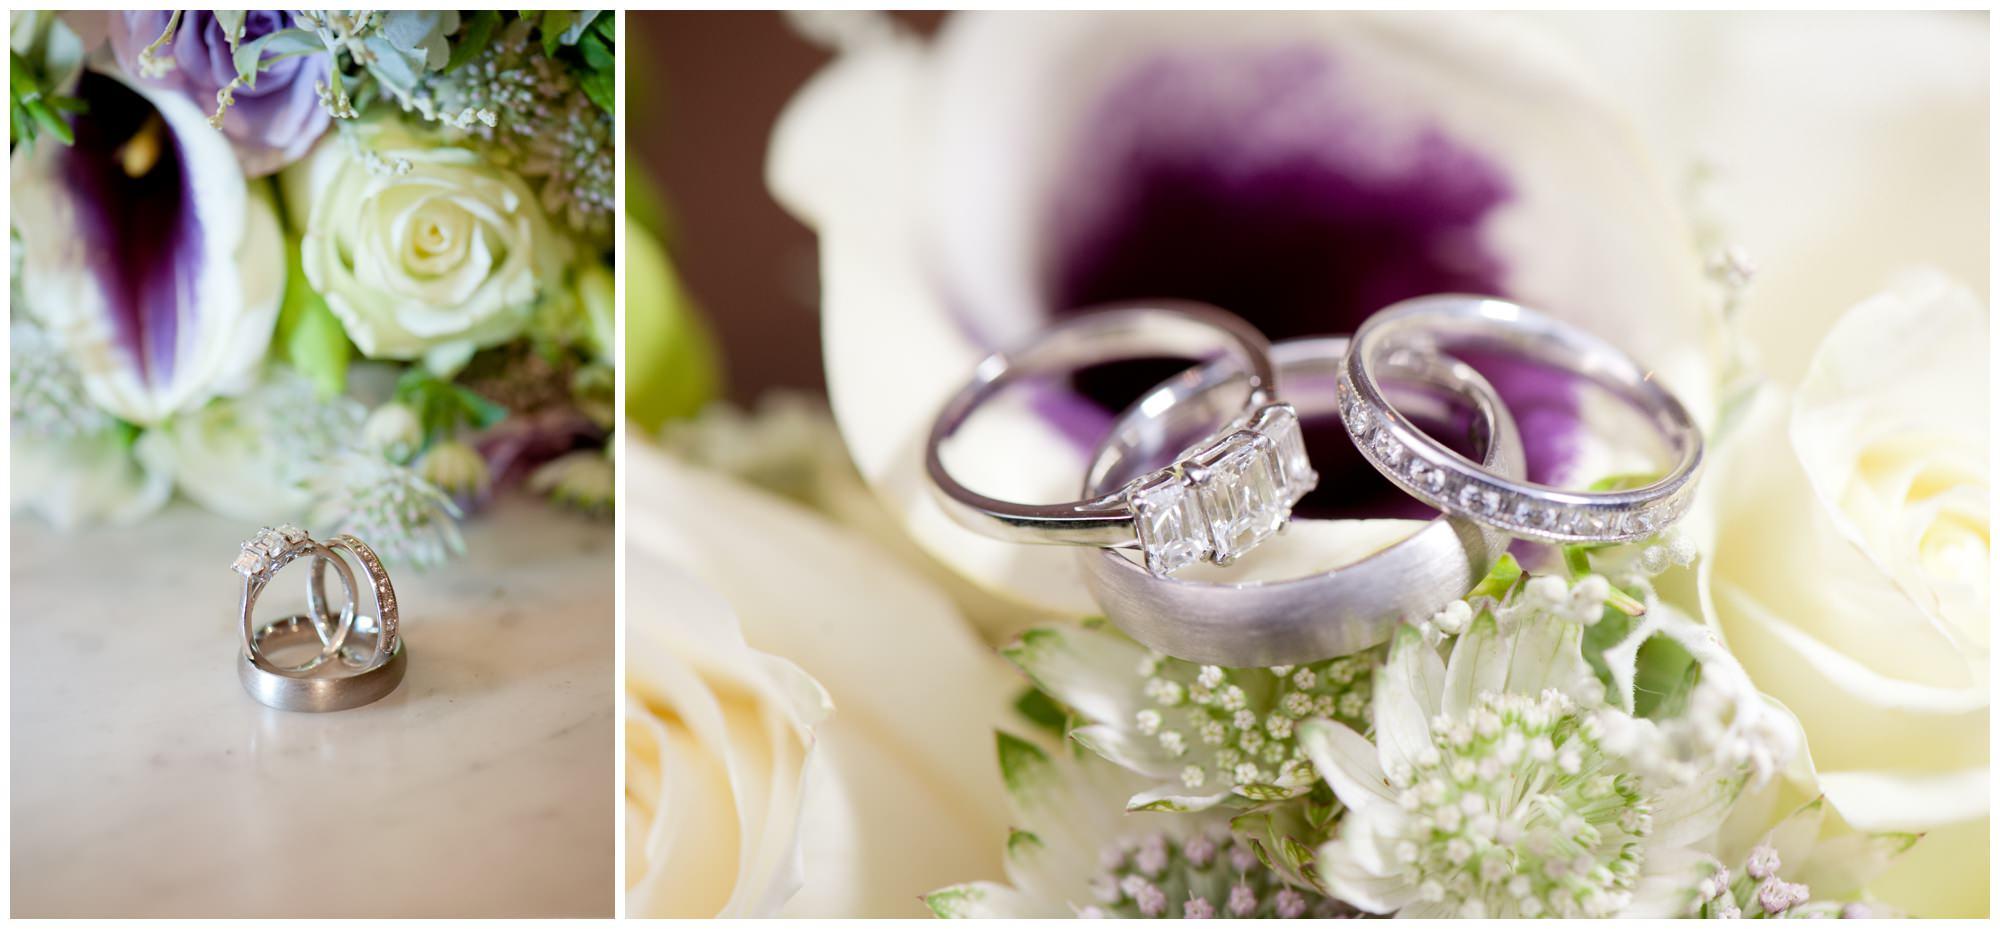 Wedding Rings at Hampshire Wedding